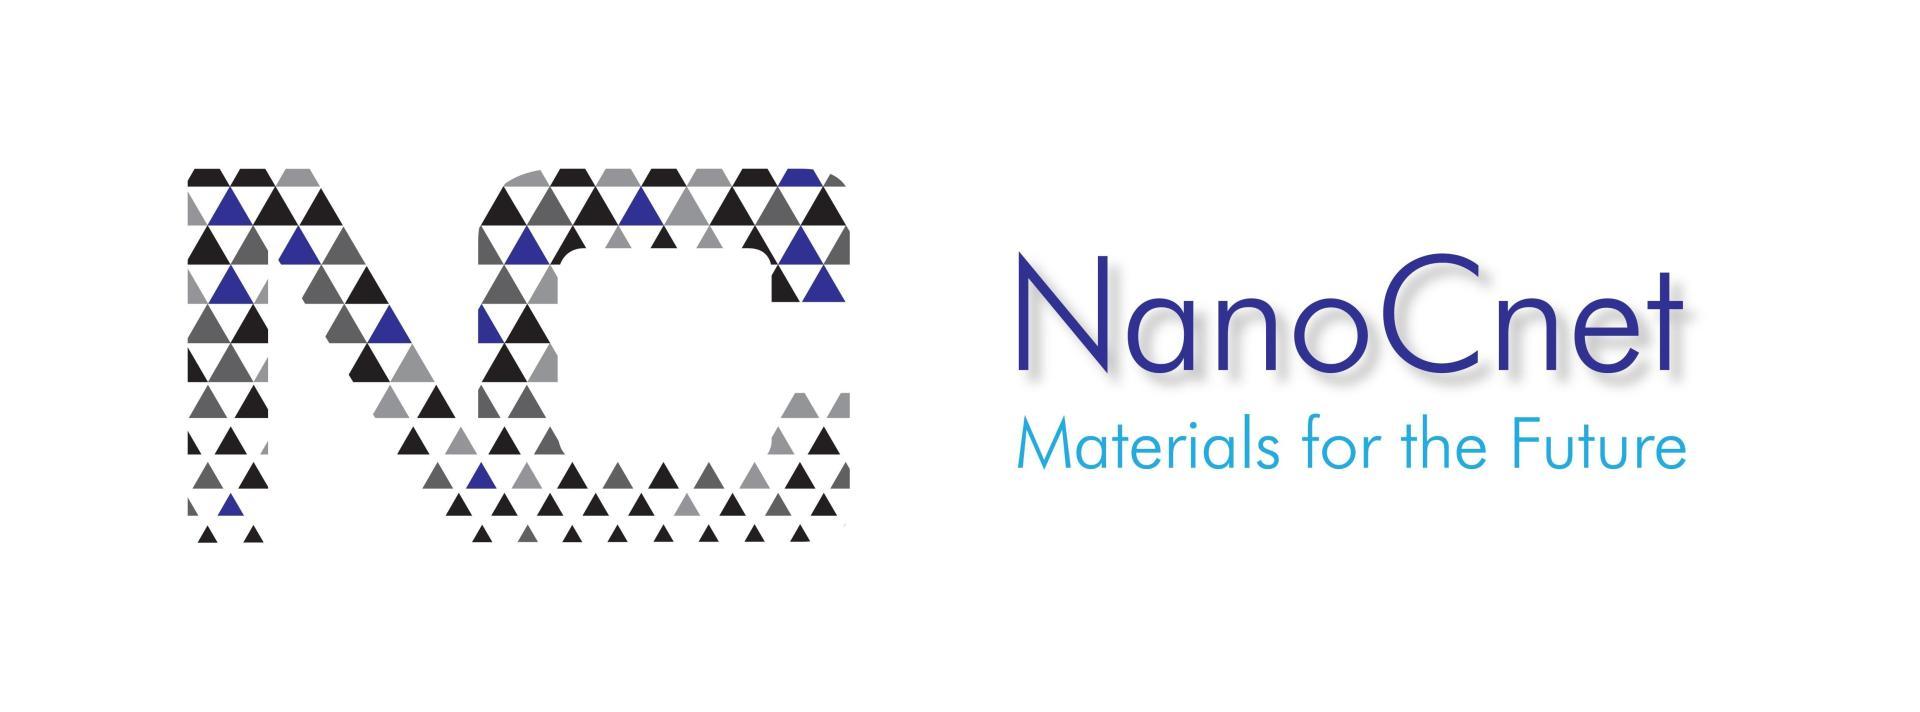 NanoCnet